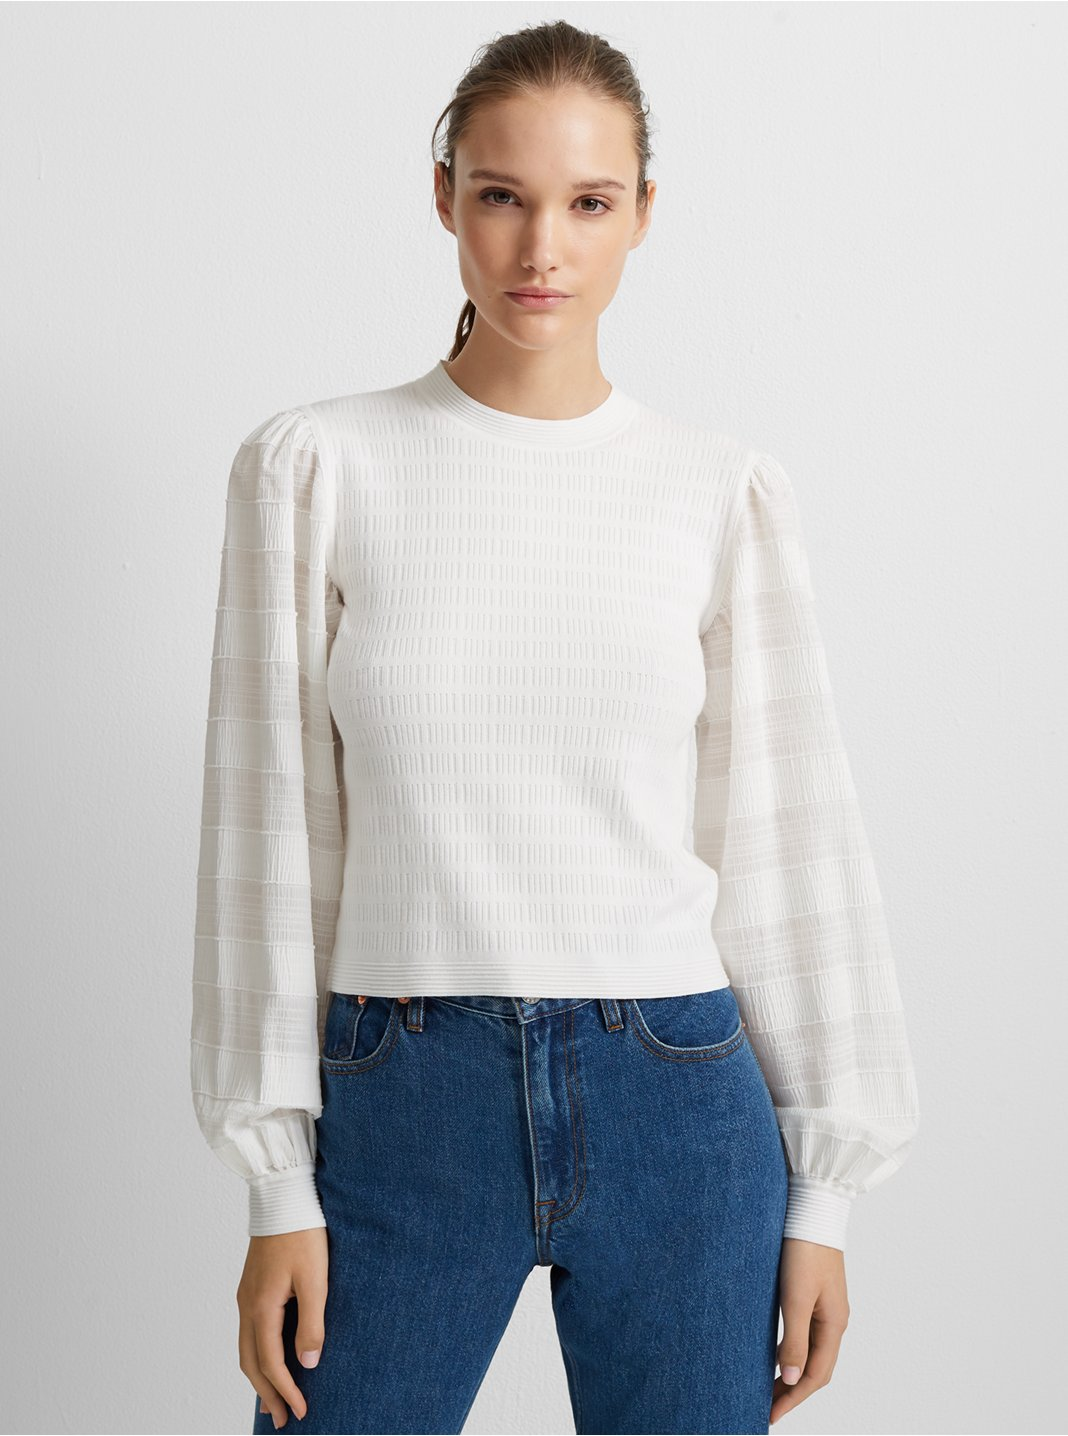 Woven Sleeve Crewneck Sweater